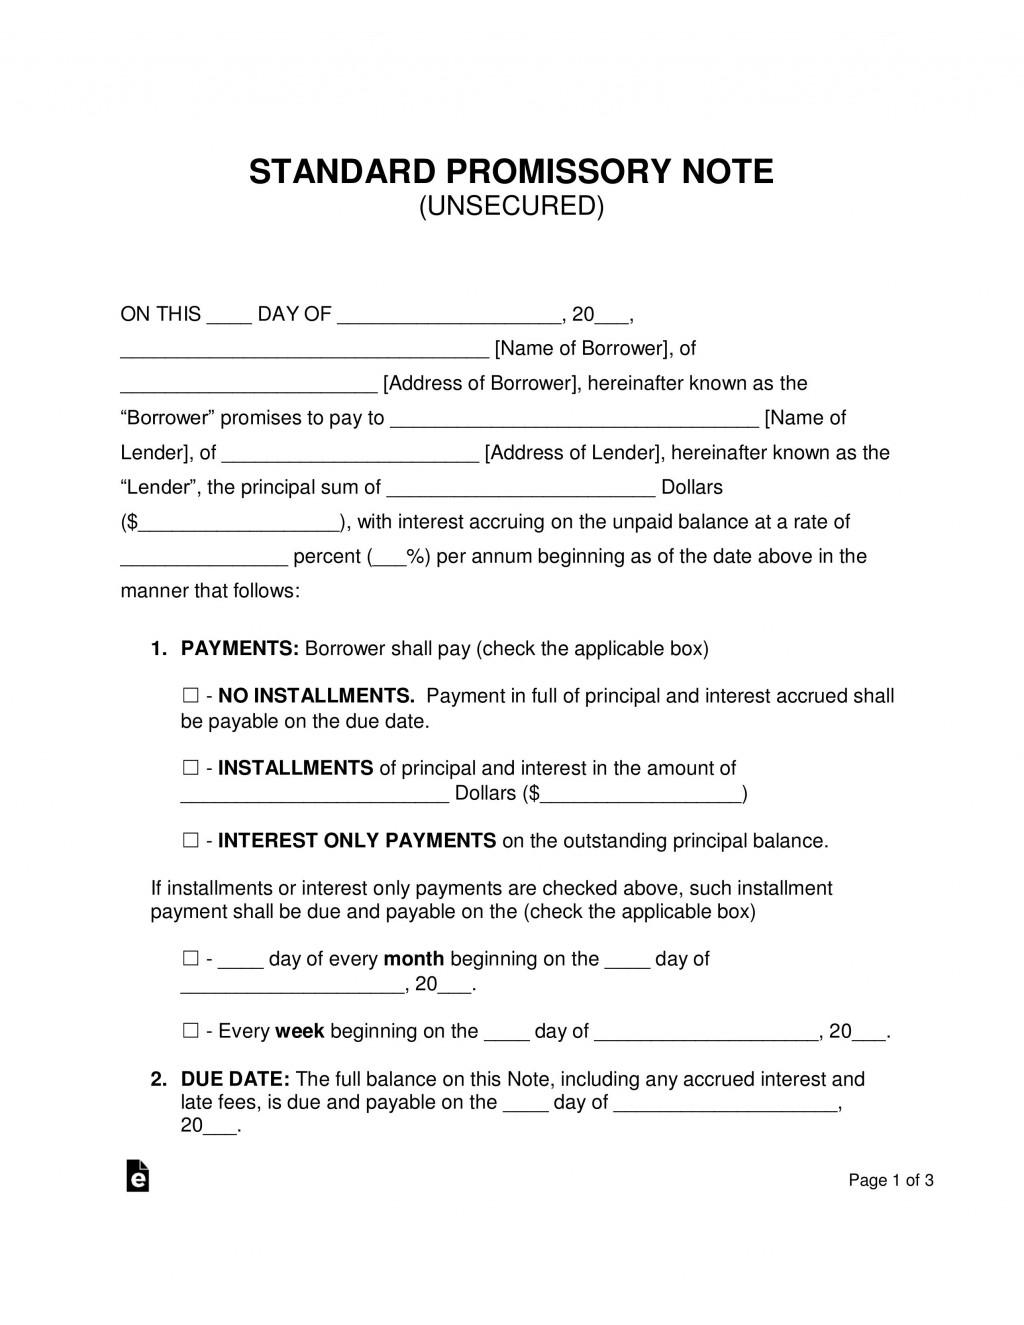 008 Sensational Promissory Note Template Word Image  Document Uk Sample In FormatLarge